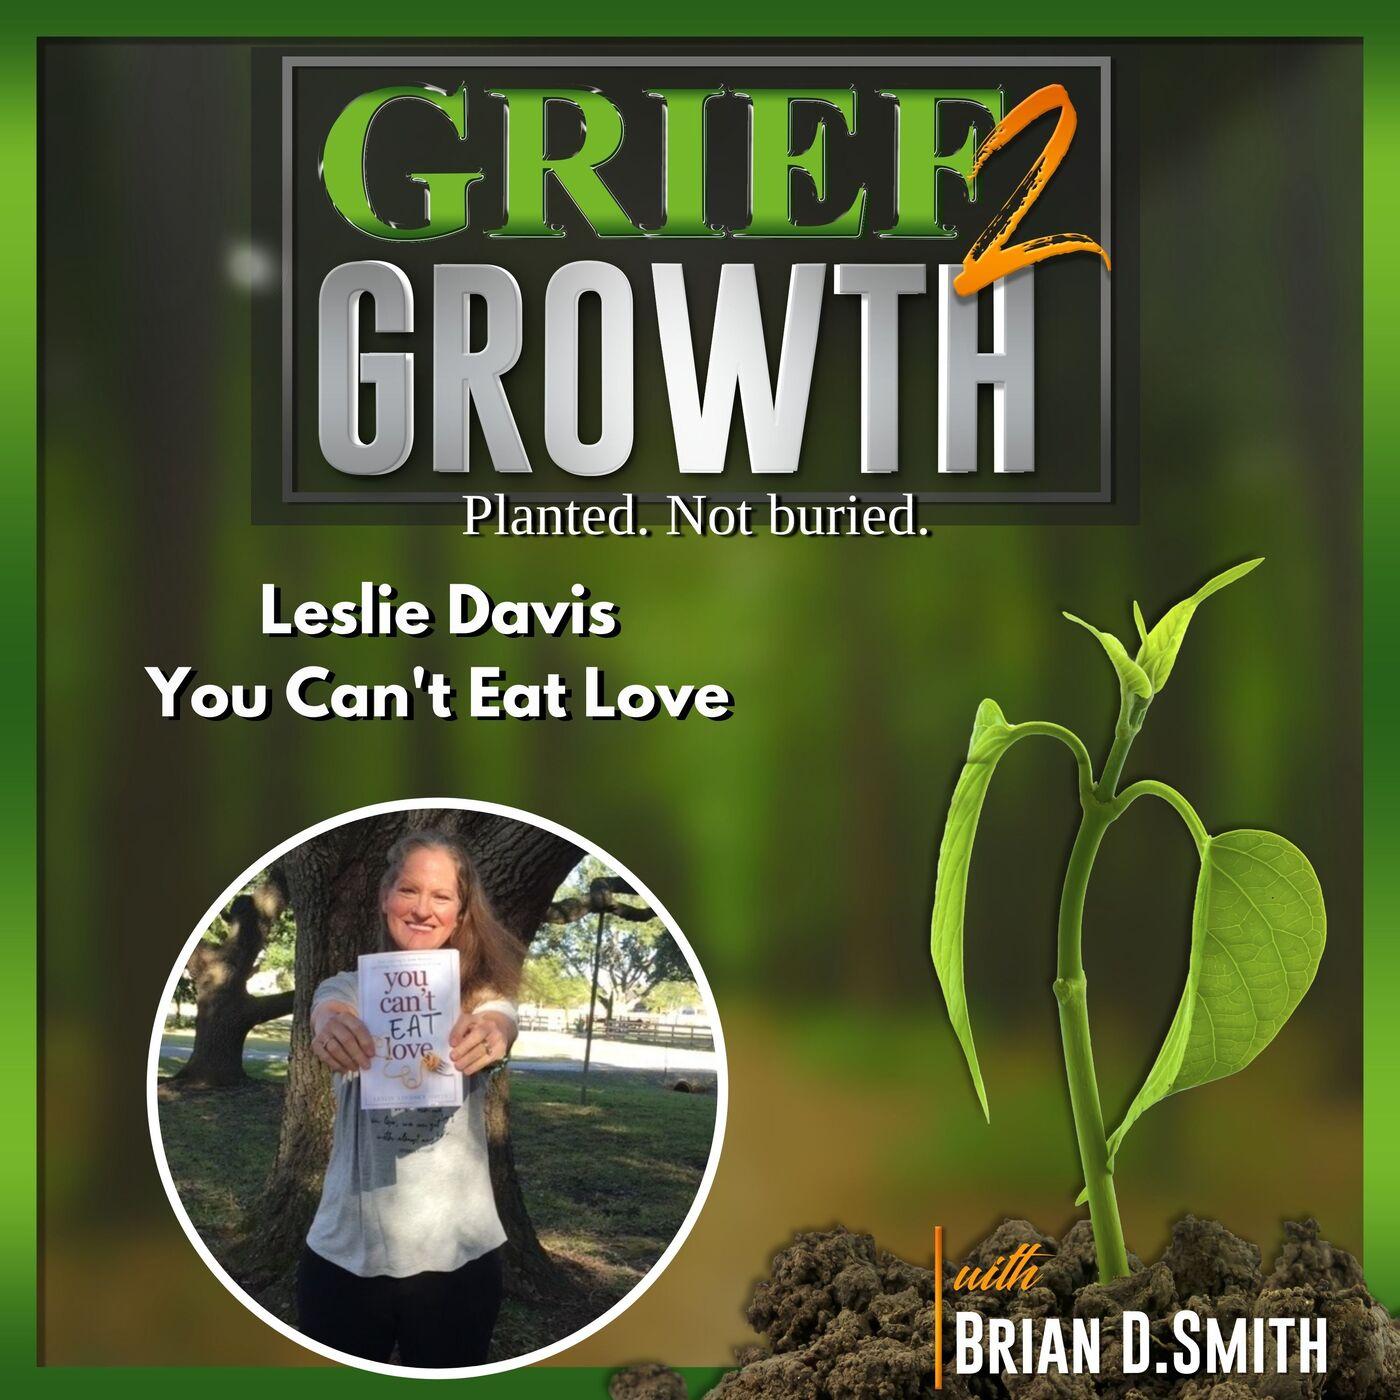 Leslie Davis- You Can't Eat Love